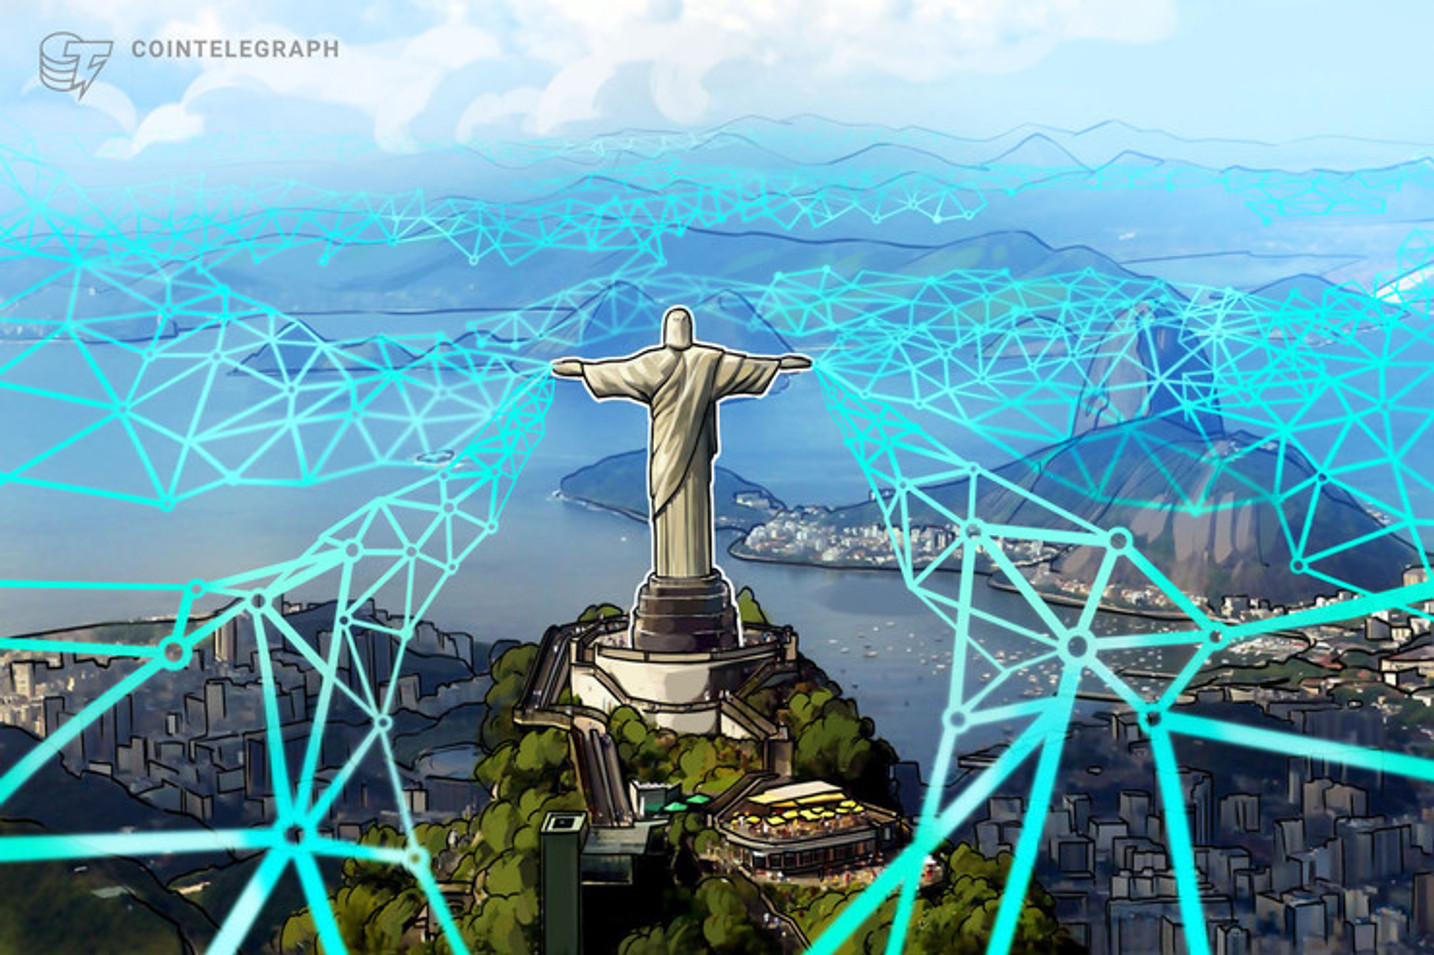 Brasil, Uruguai, Paraguai e Argentina se reúnem para debater plataforma em blockchain para o Mercosul